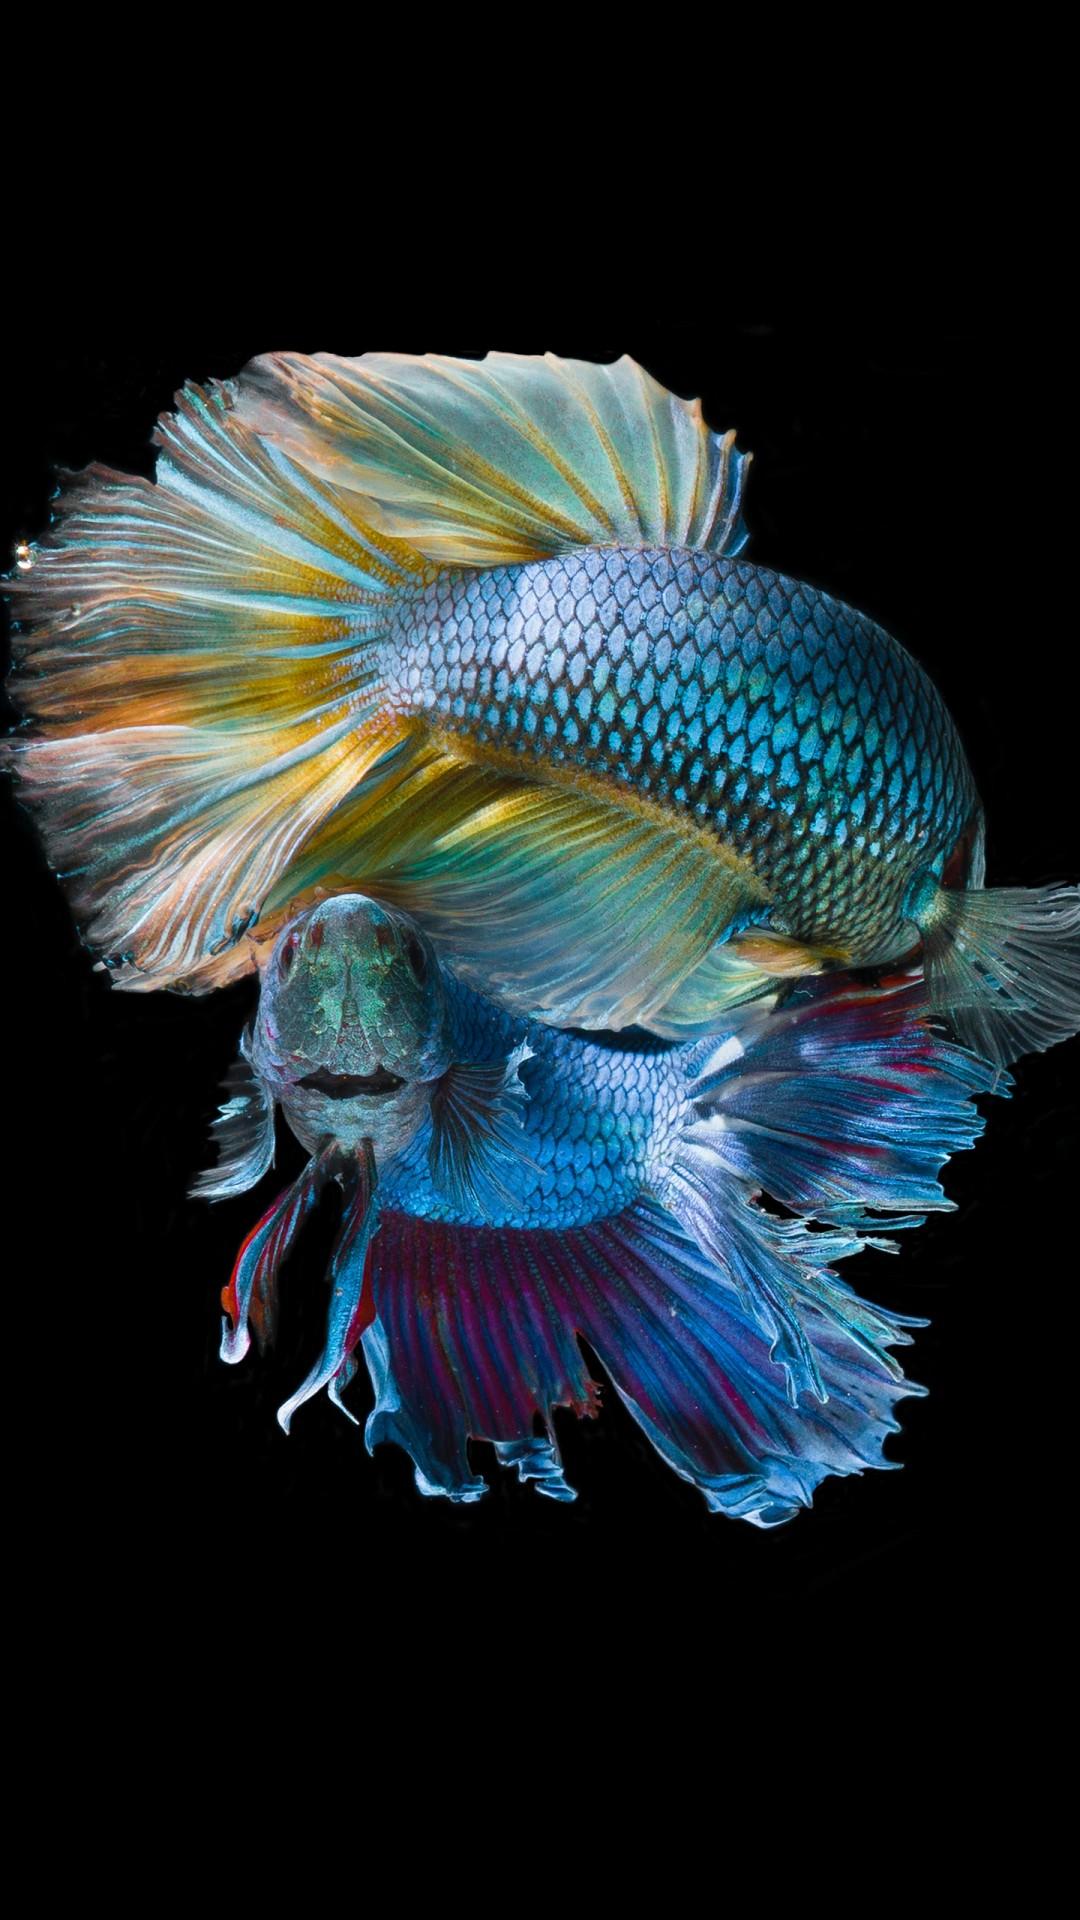 3d Fish Wallpaper Live Underwater Fish 5k Wallpapers Hd Wallpapers Id 23678